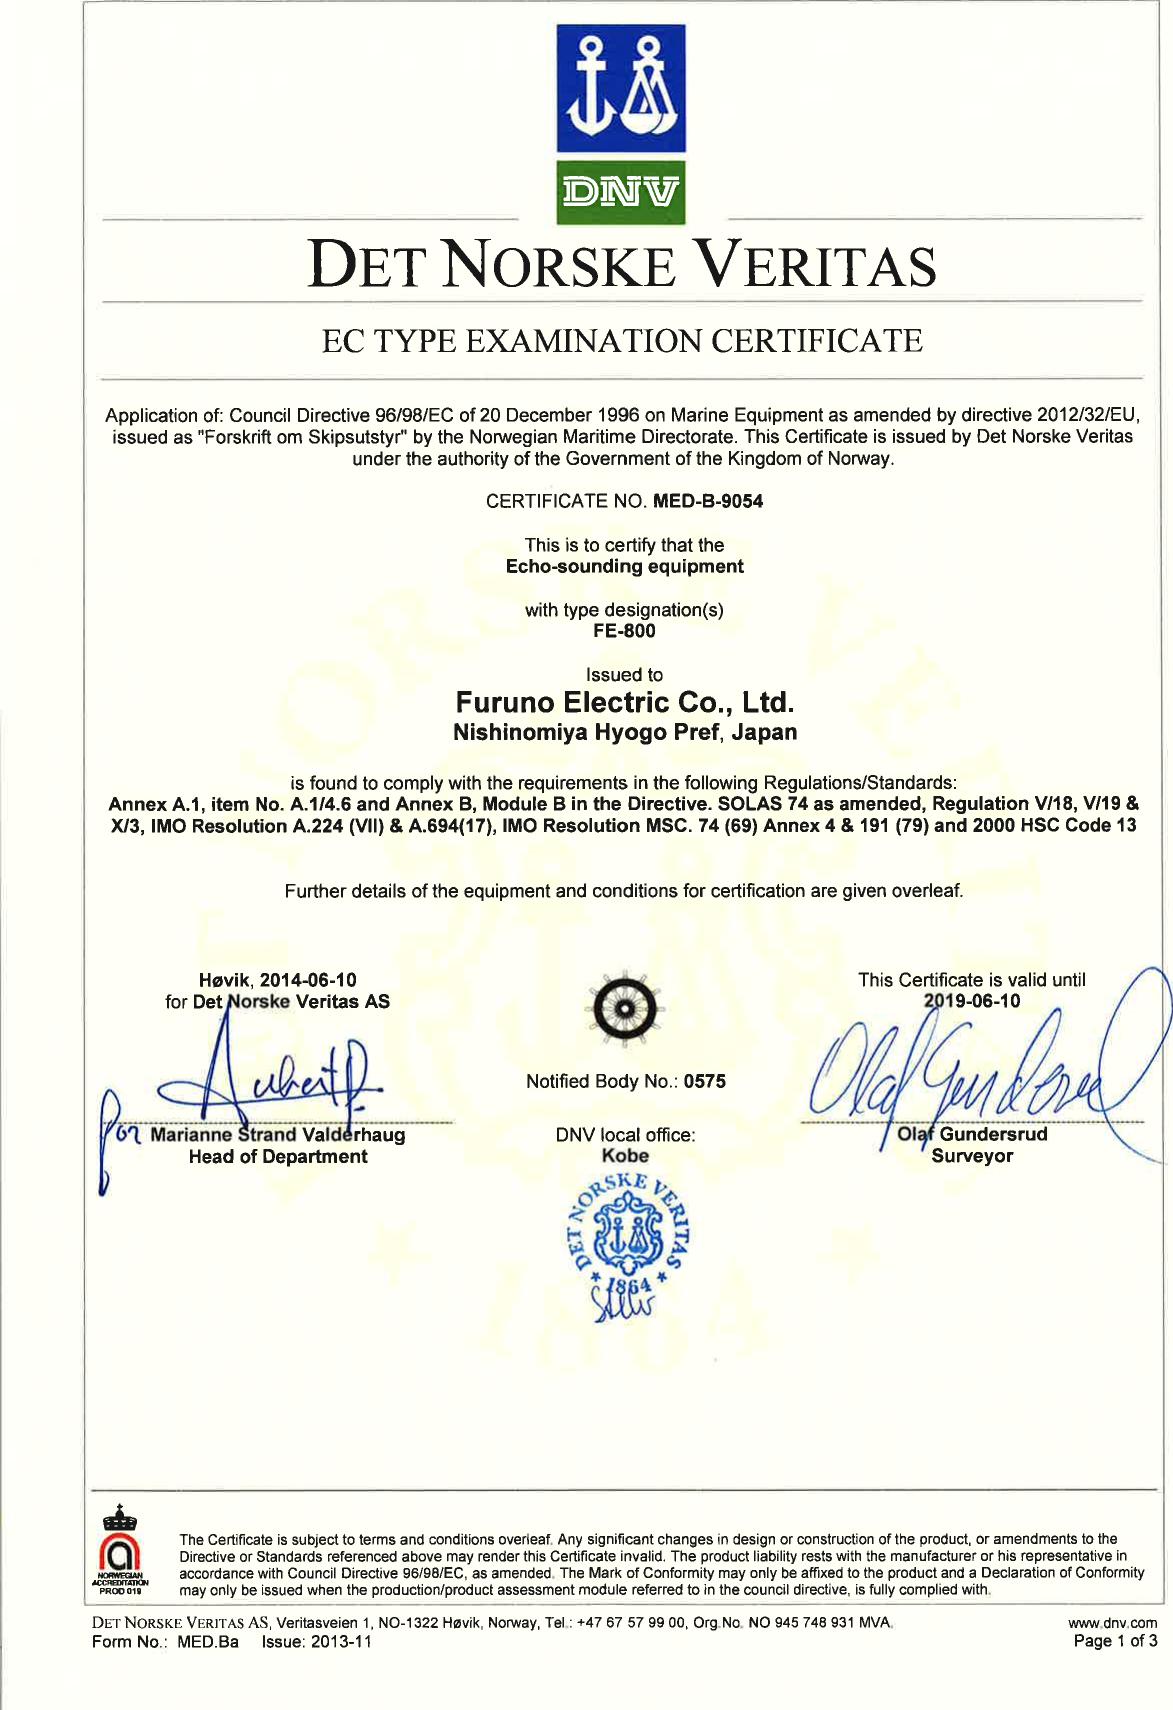 Furuno Fe800 Certification